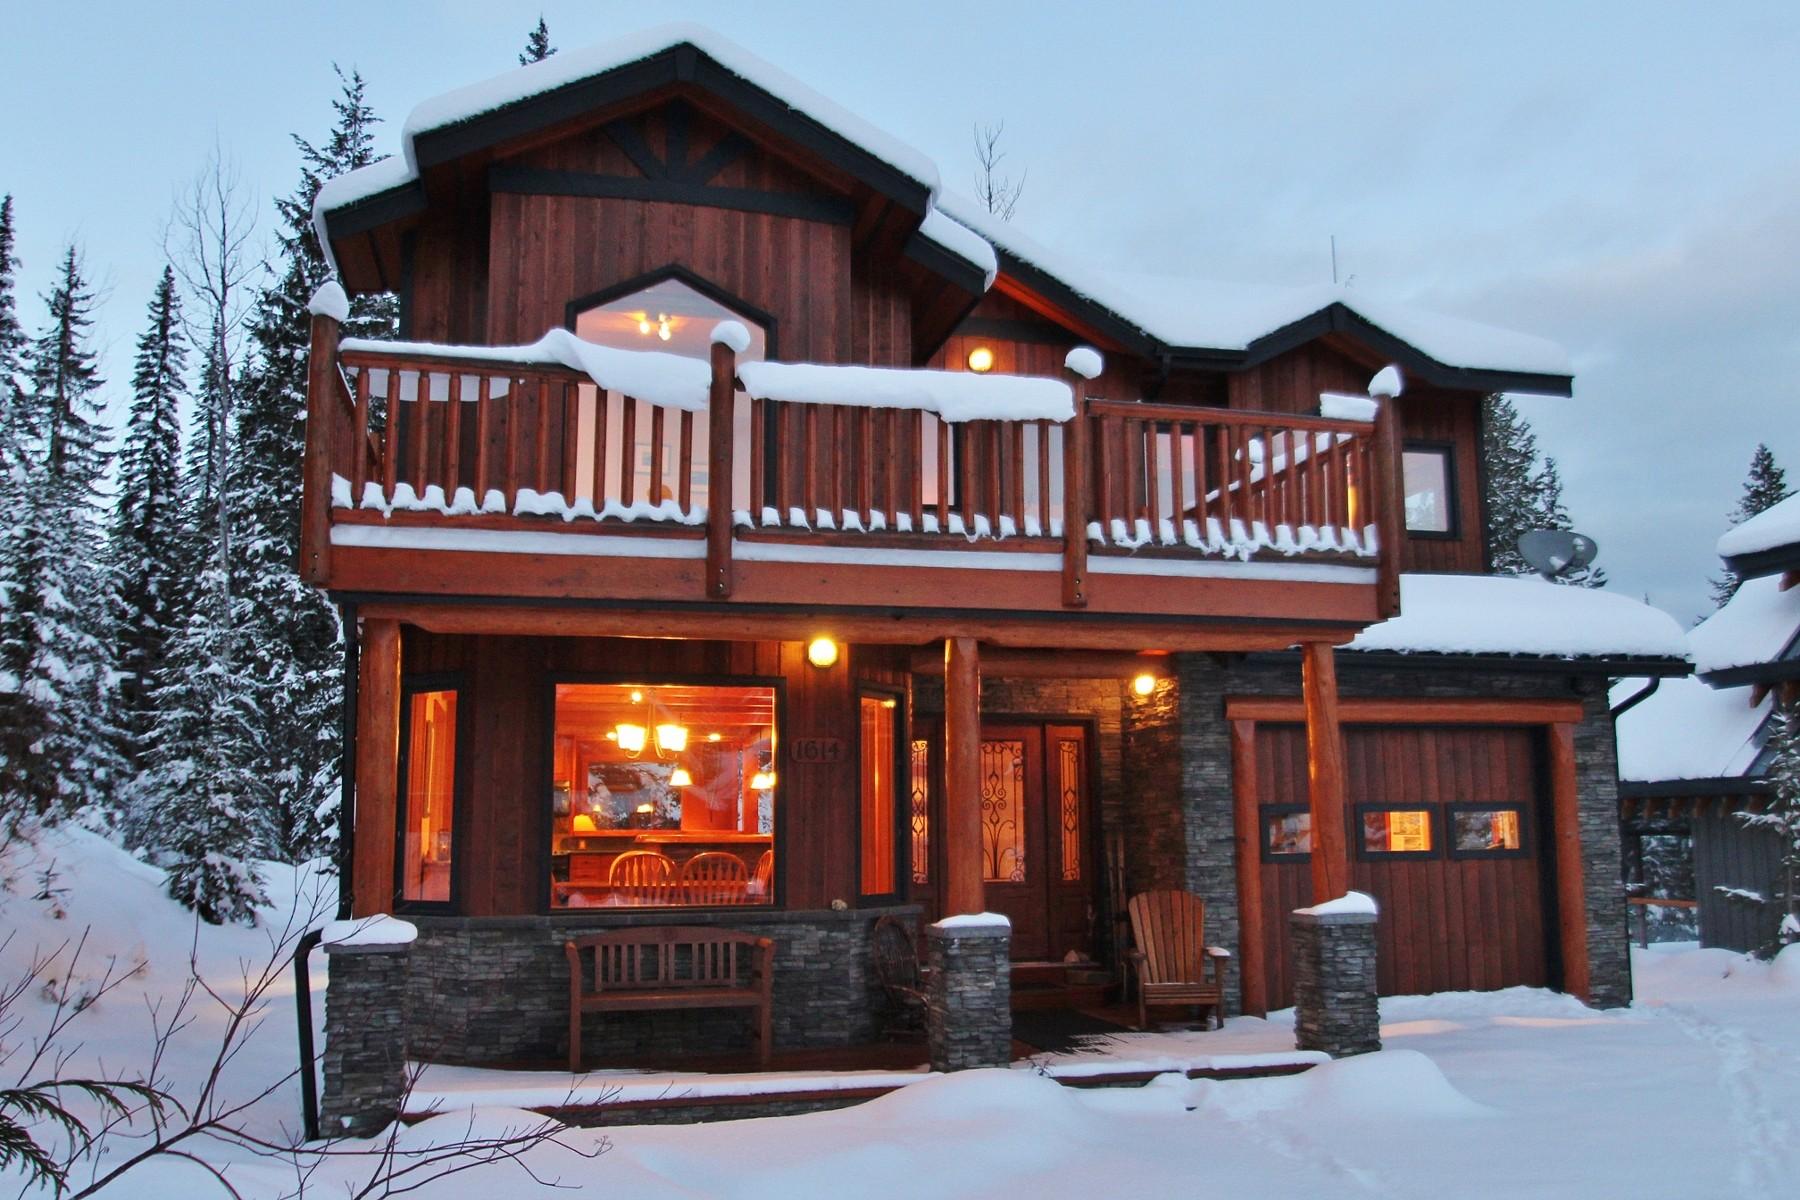 Casa para uma família para Venda às Cedar Creek Cabin in the Woods 1614 Purcell Woods Golden, Columbia Britanica V0A1H0 Canadá